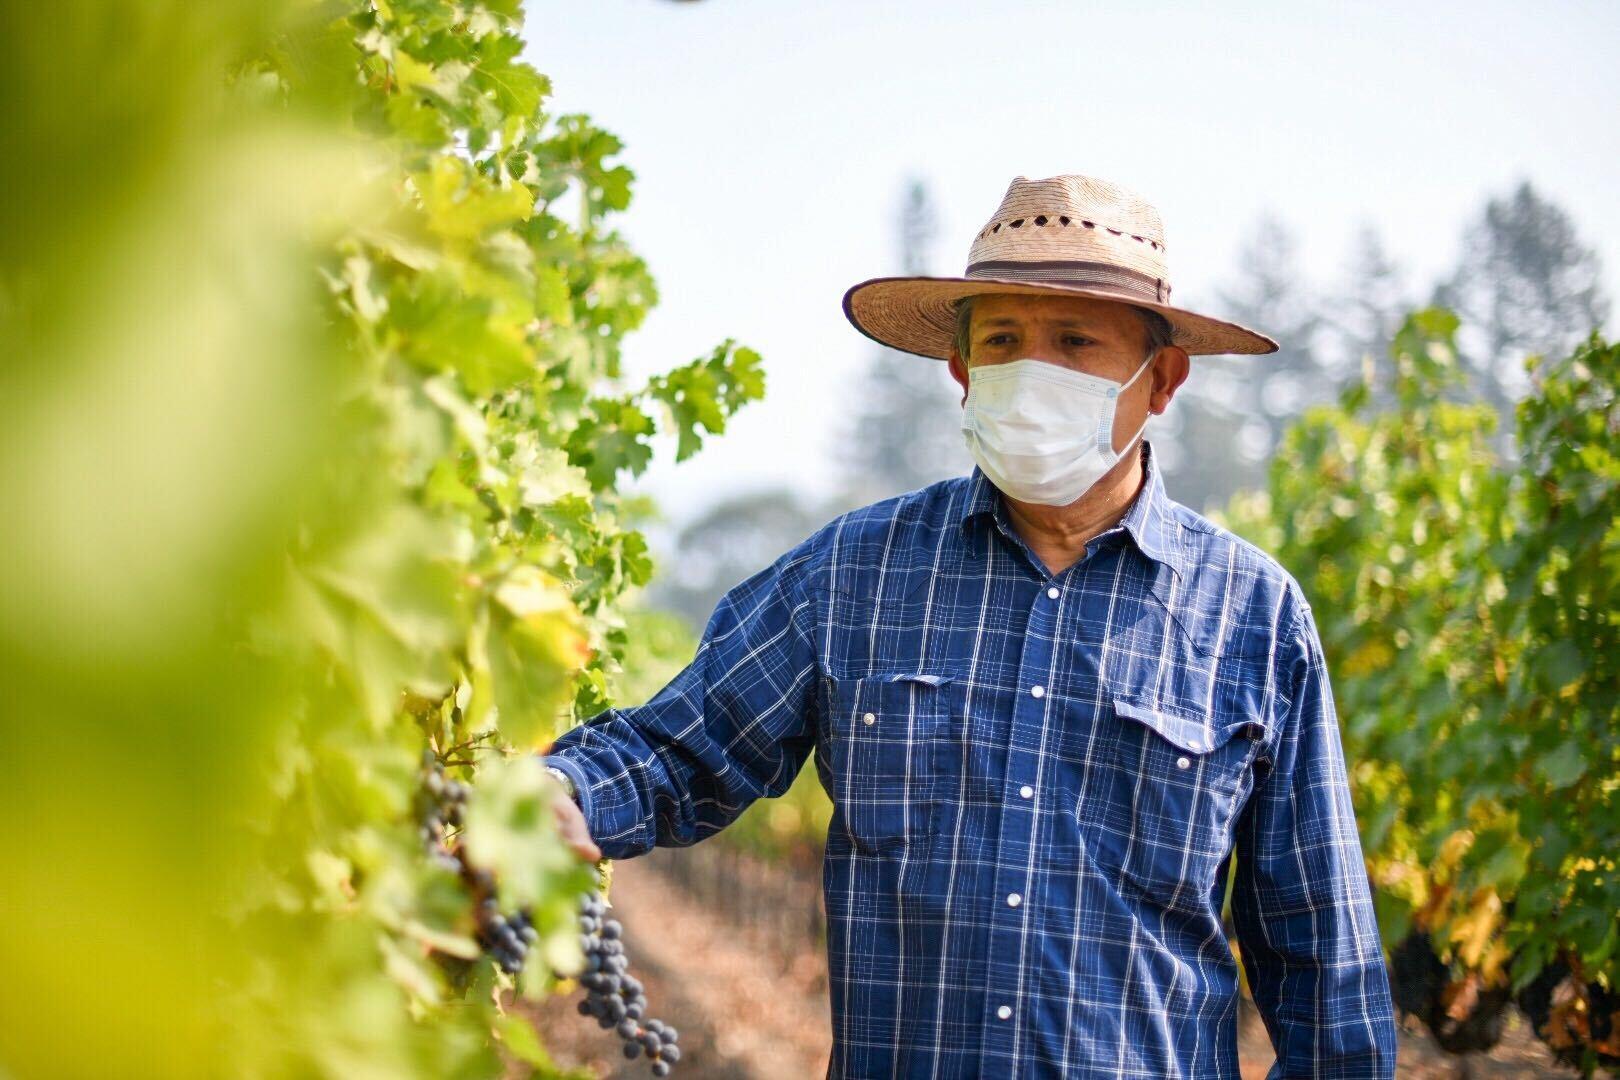 Enrique Lopez, of Servin-Lopez Vineyard Management, at Garton Vineyards in Napa on Sept. 30.